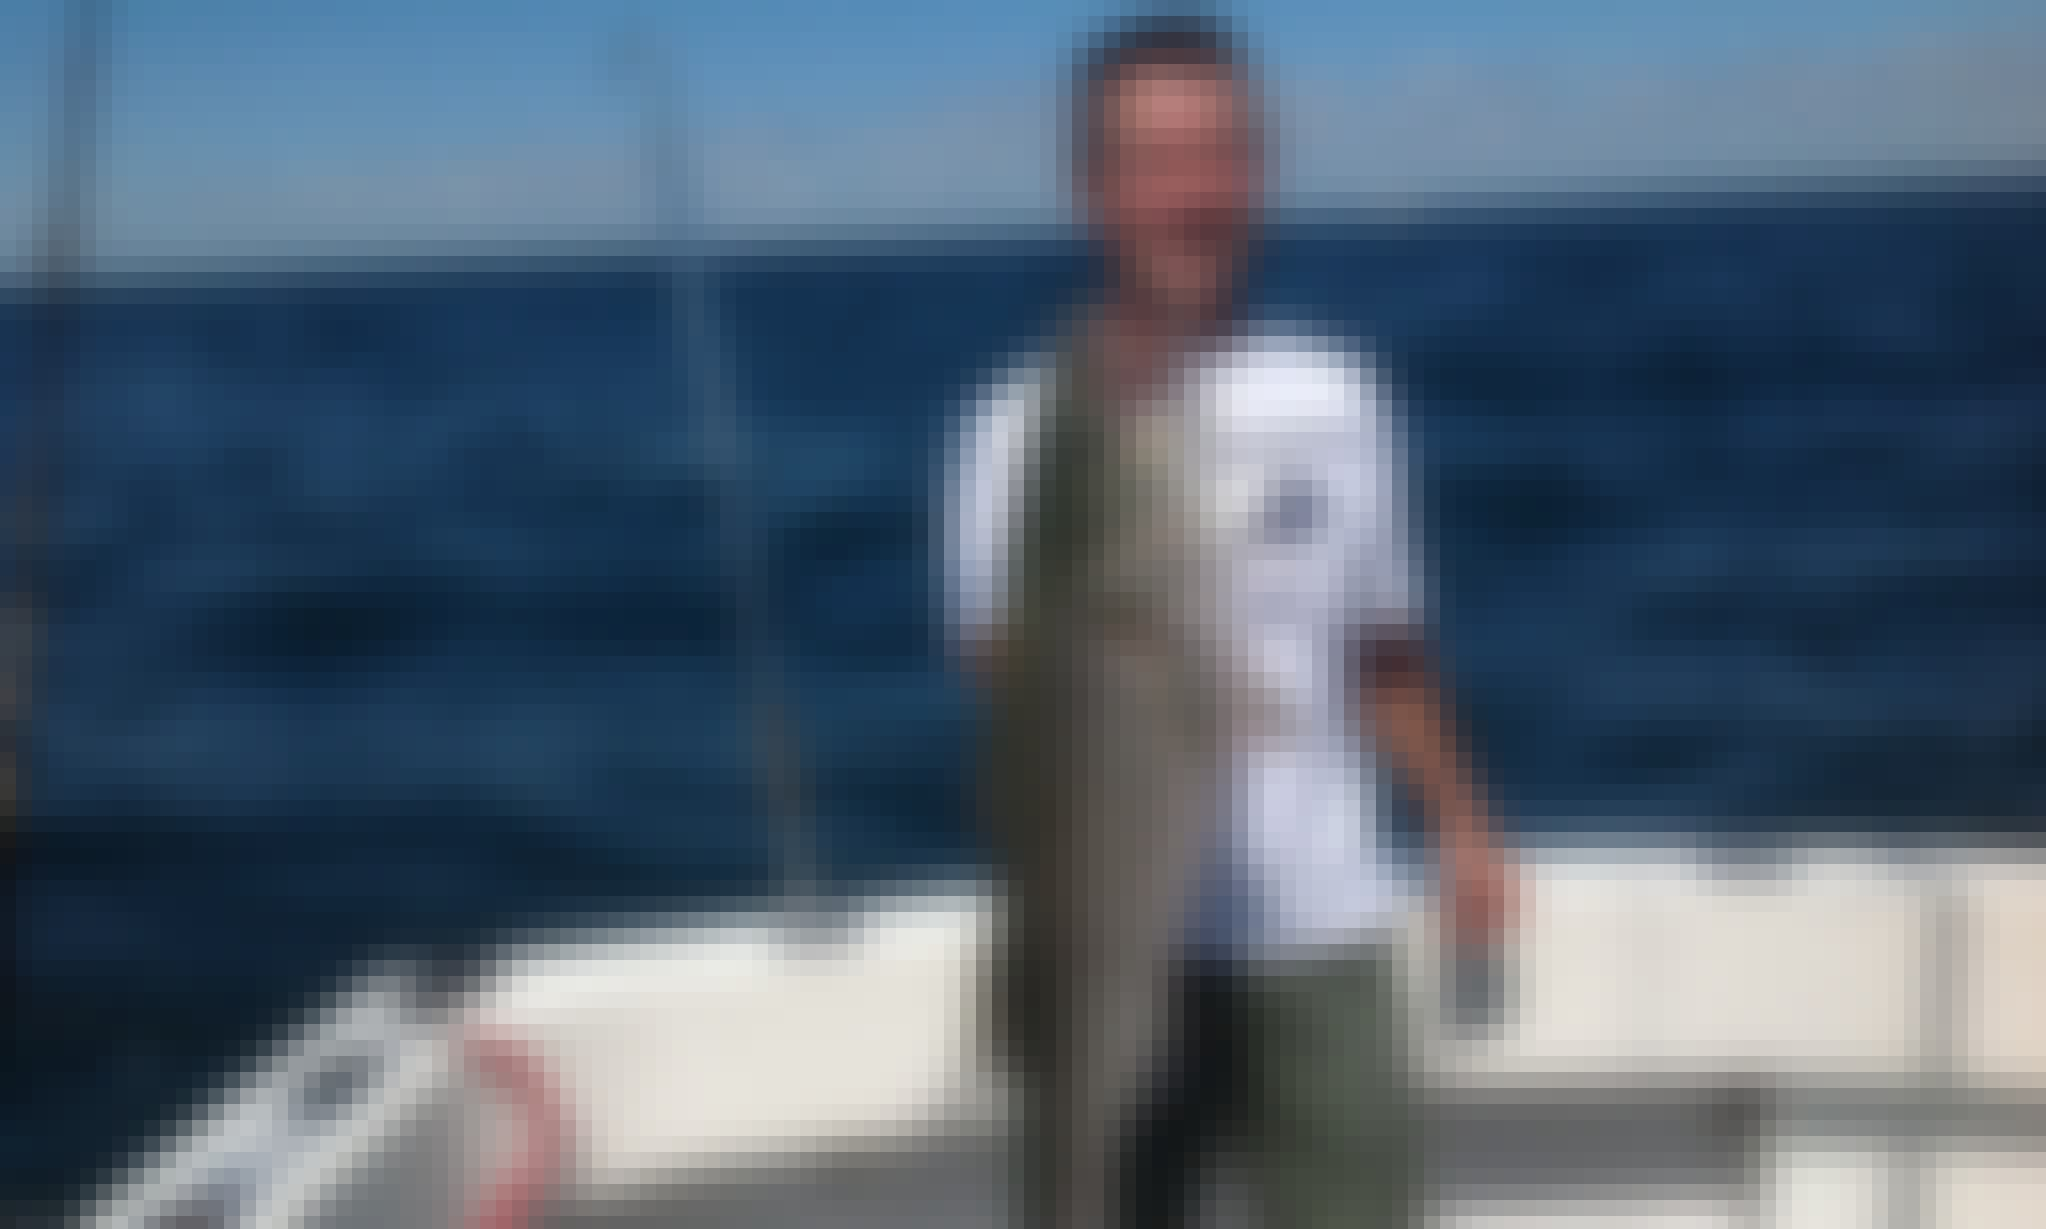 Enjoy Fishing in Narragansett, Rhode Island with Captain Scott